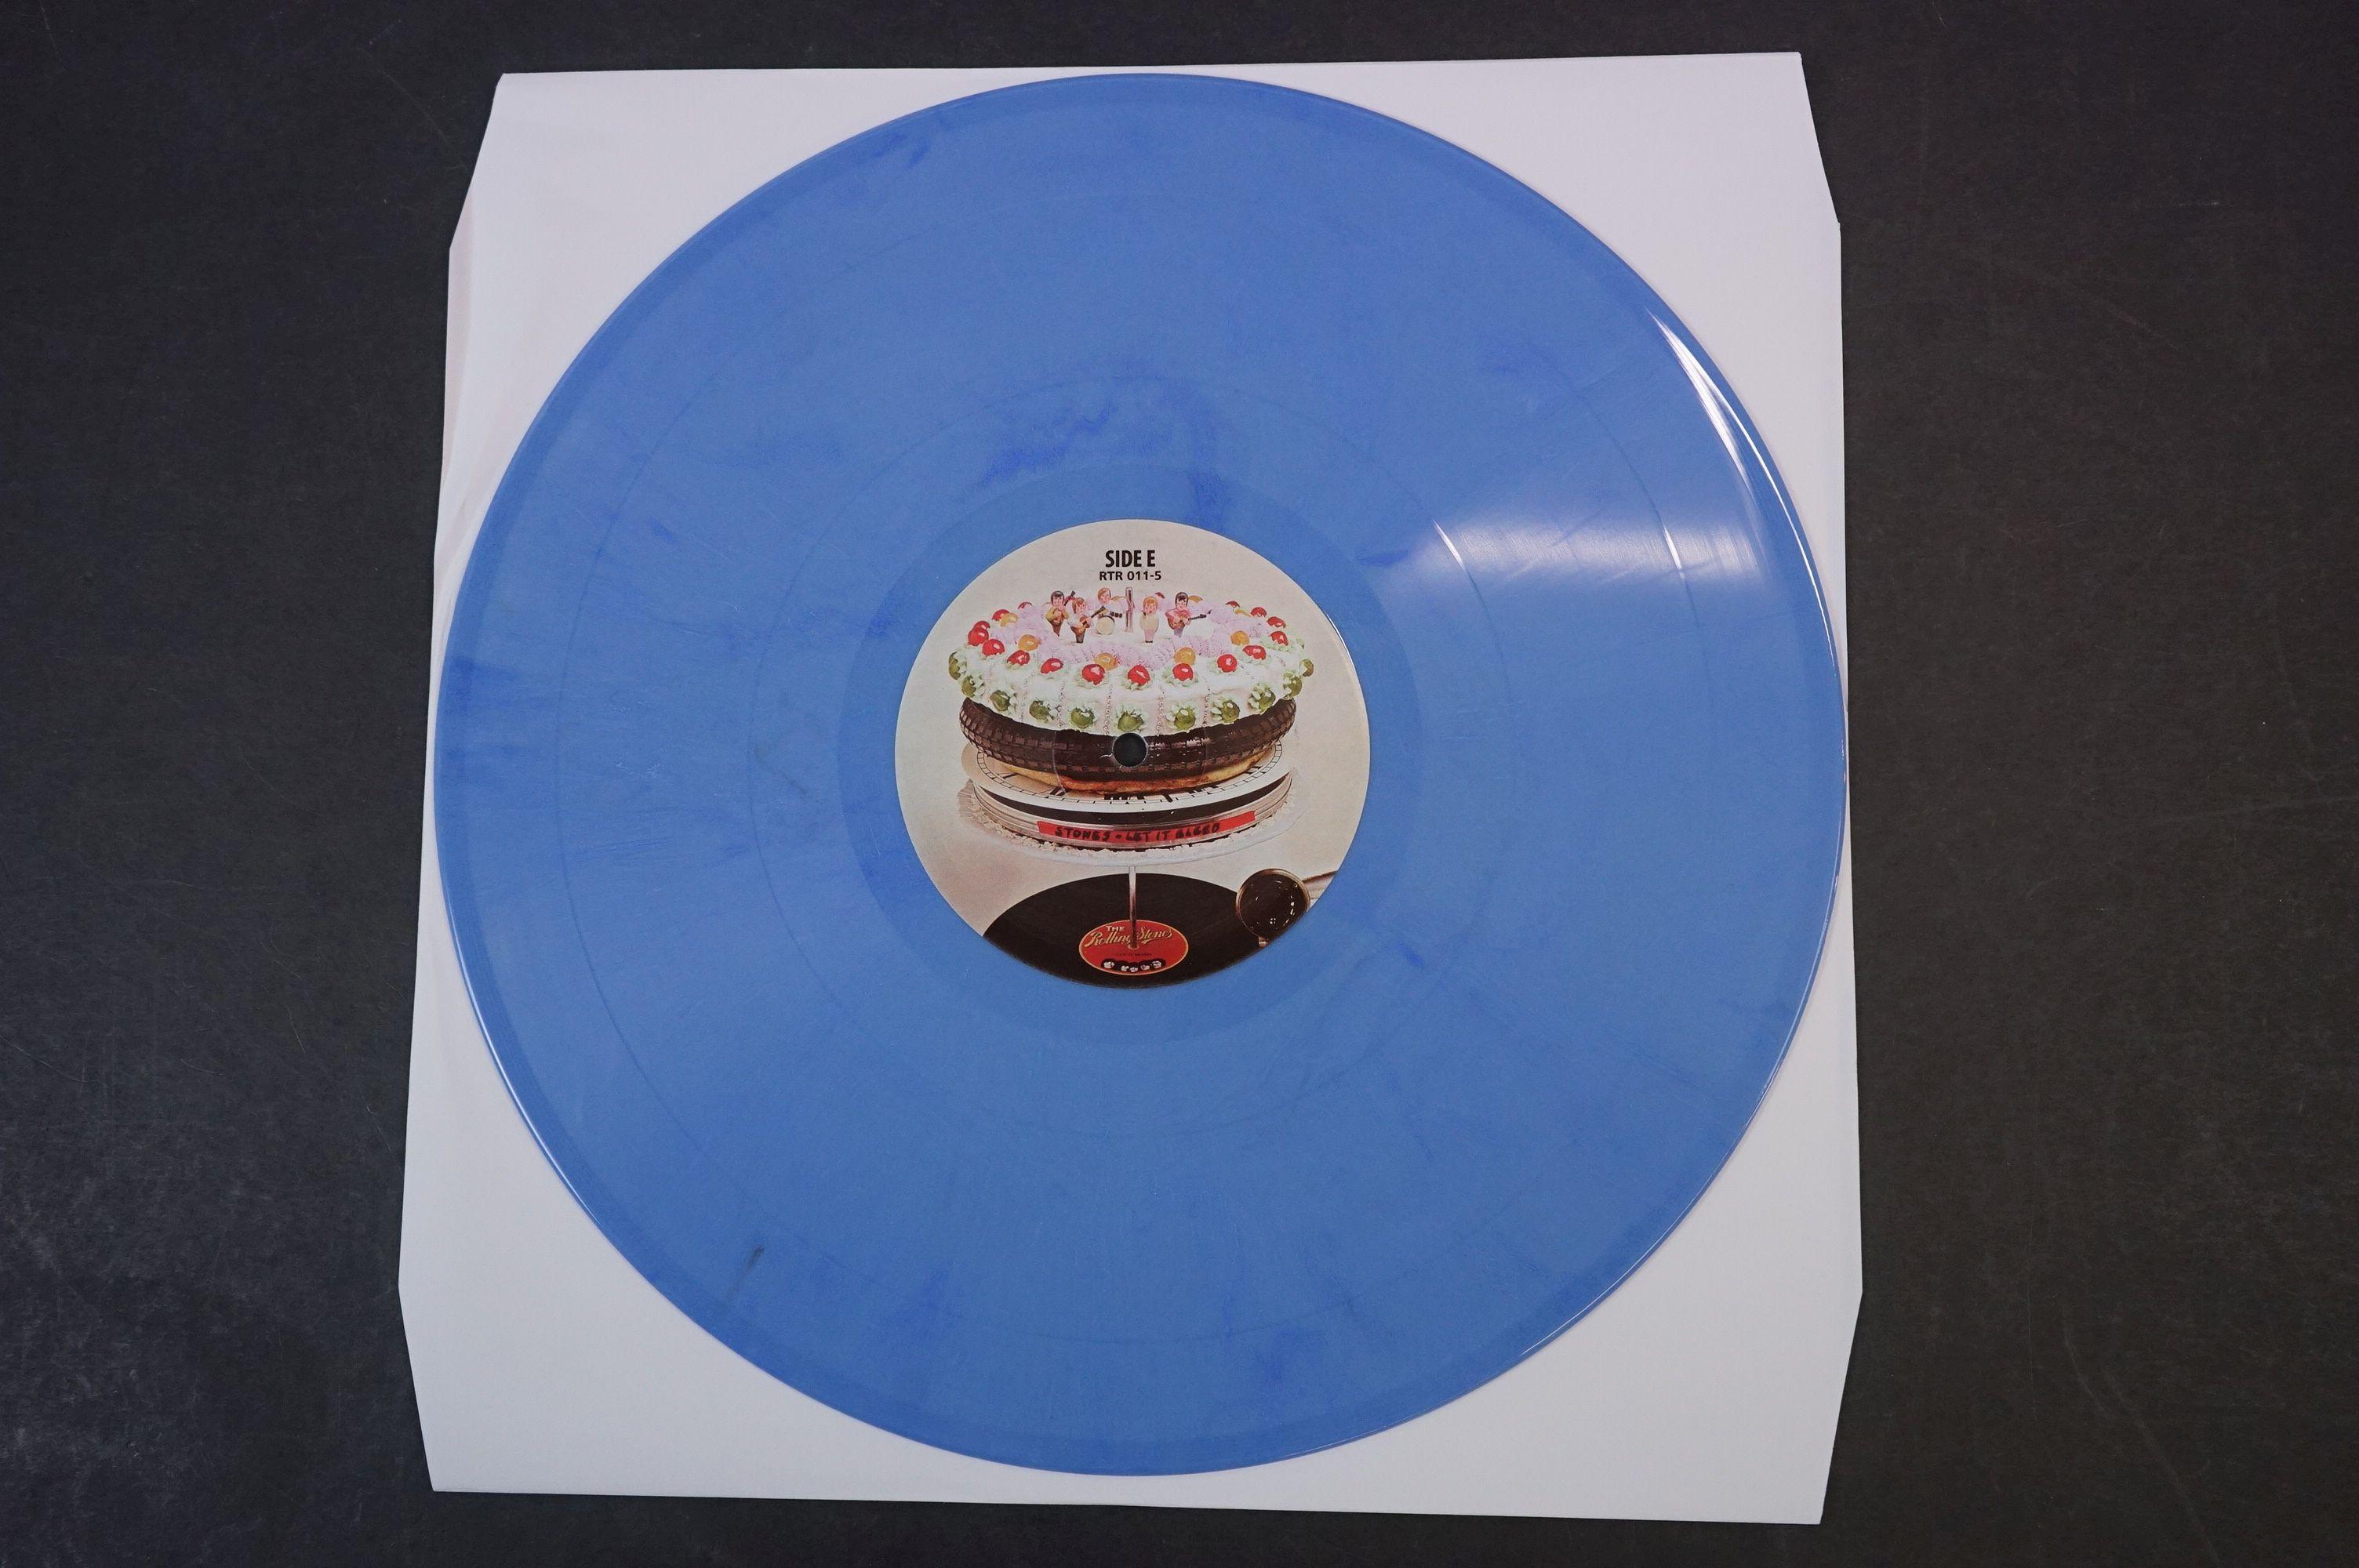 Vinyl - ltd edn The Real Alternate Album Rolling Stones Let It Bleed 3 LP / 2 CD Box Set RTR011, - Image 7 of 9